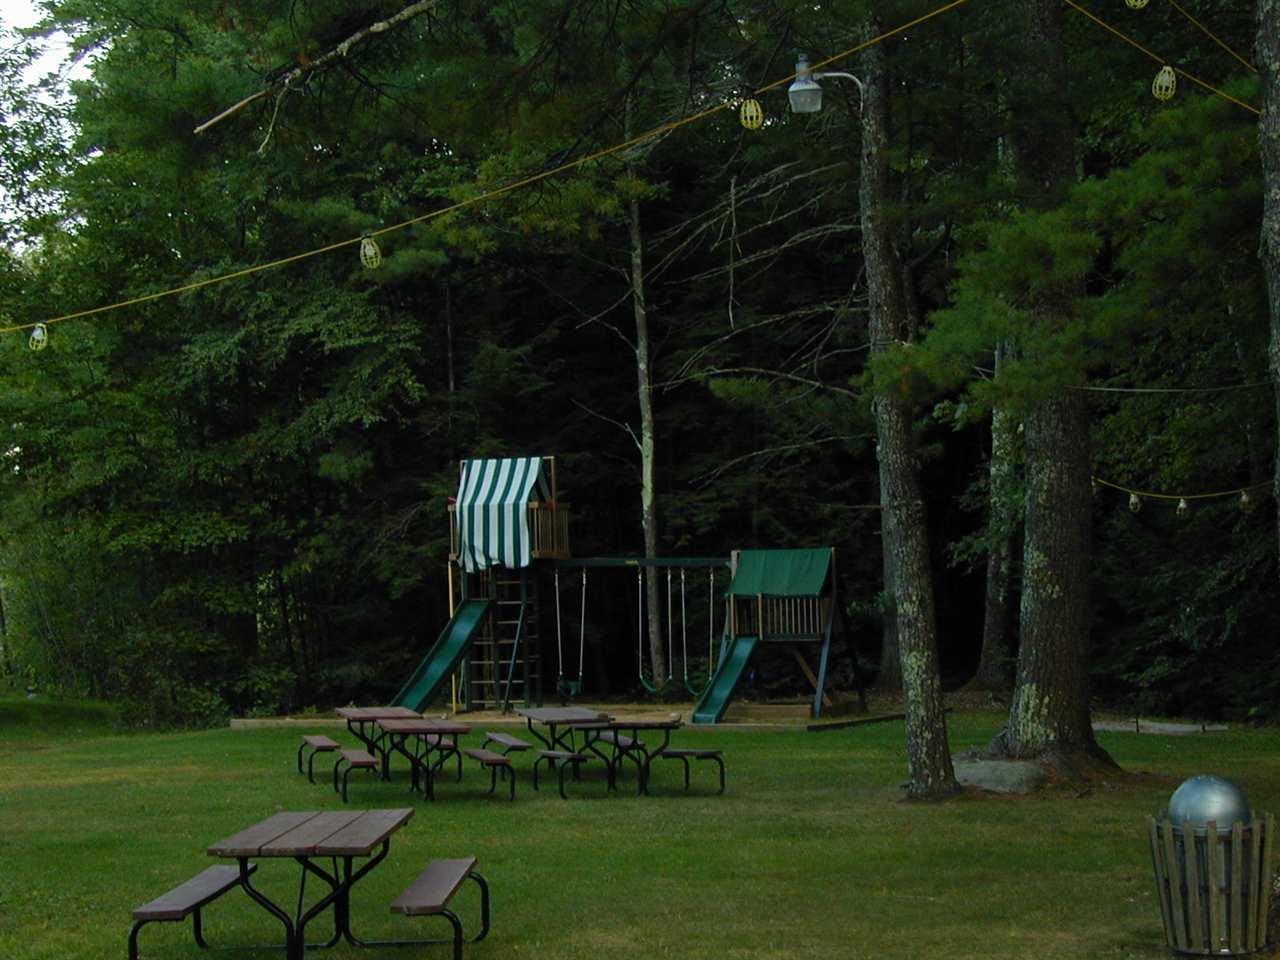 GIC Playground Area 11246177